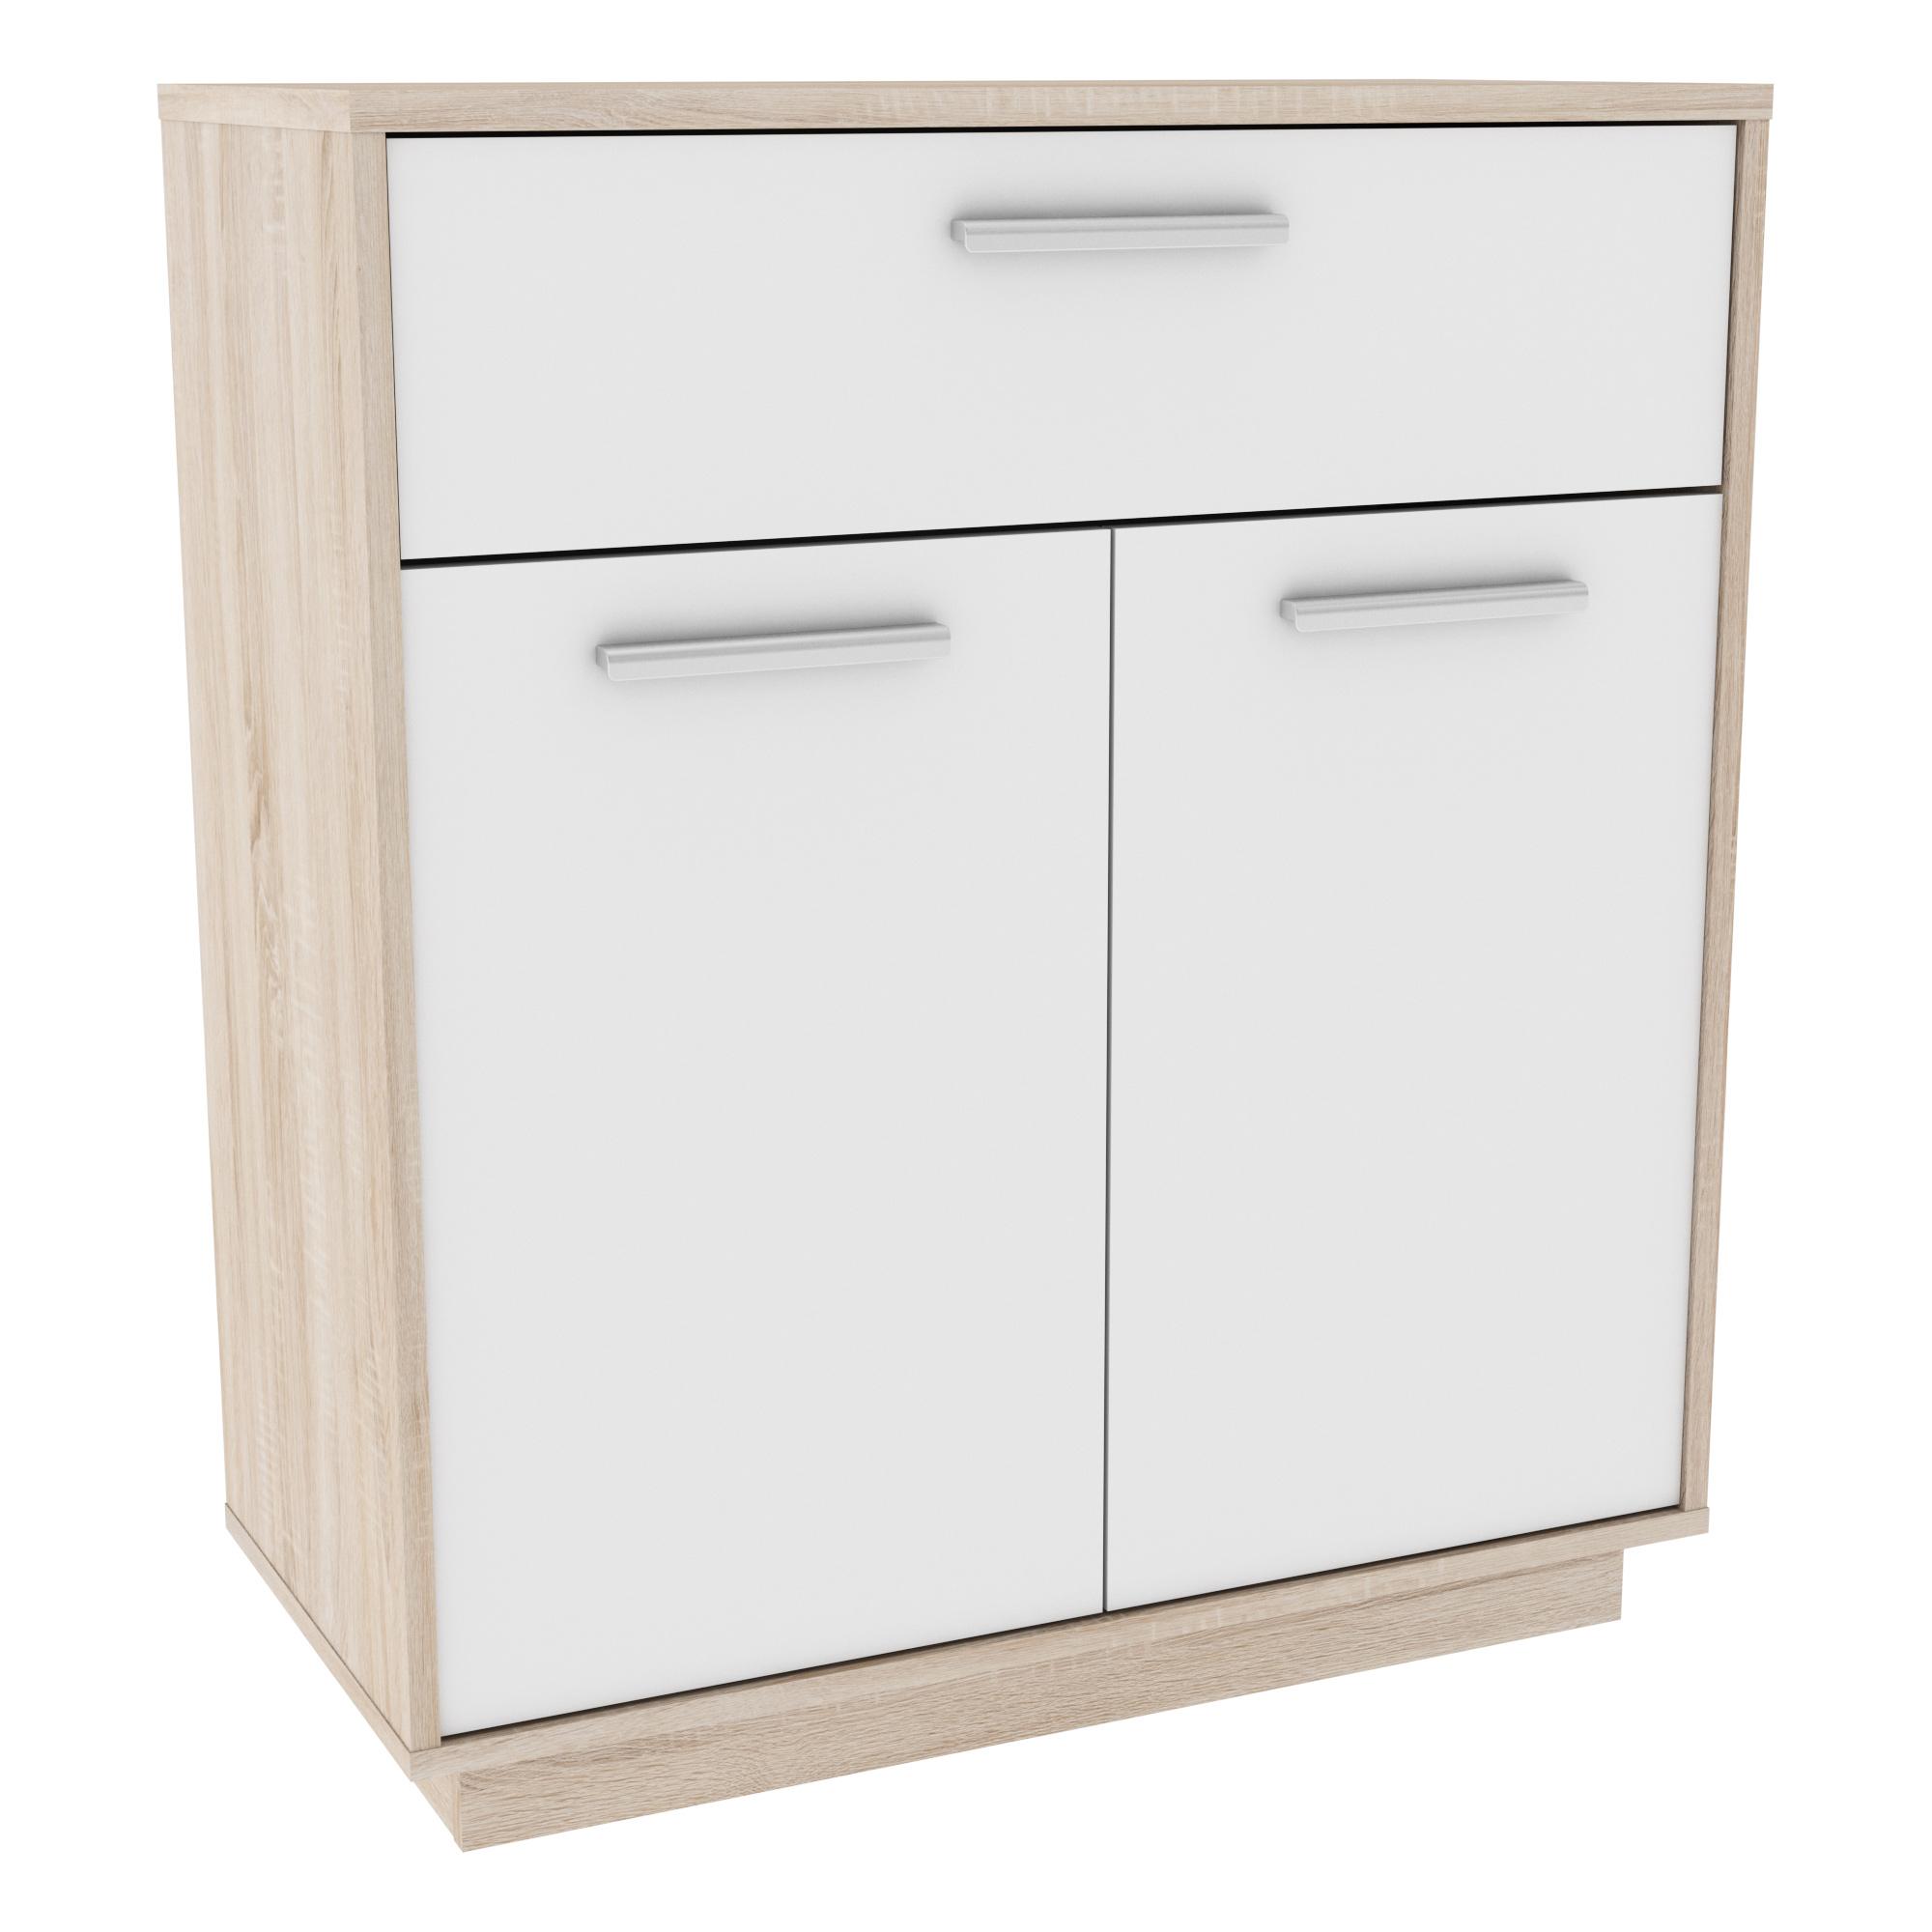 Meuble de rangement contemporain 2 portes/1 tiroir chêne brossé/blanc Sismo